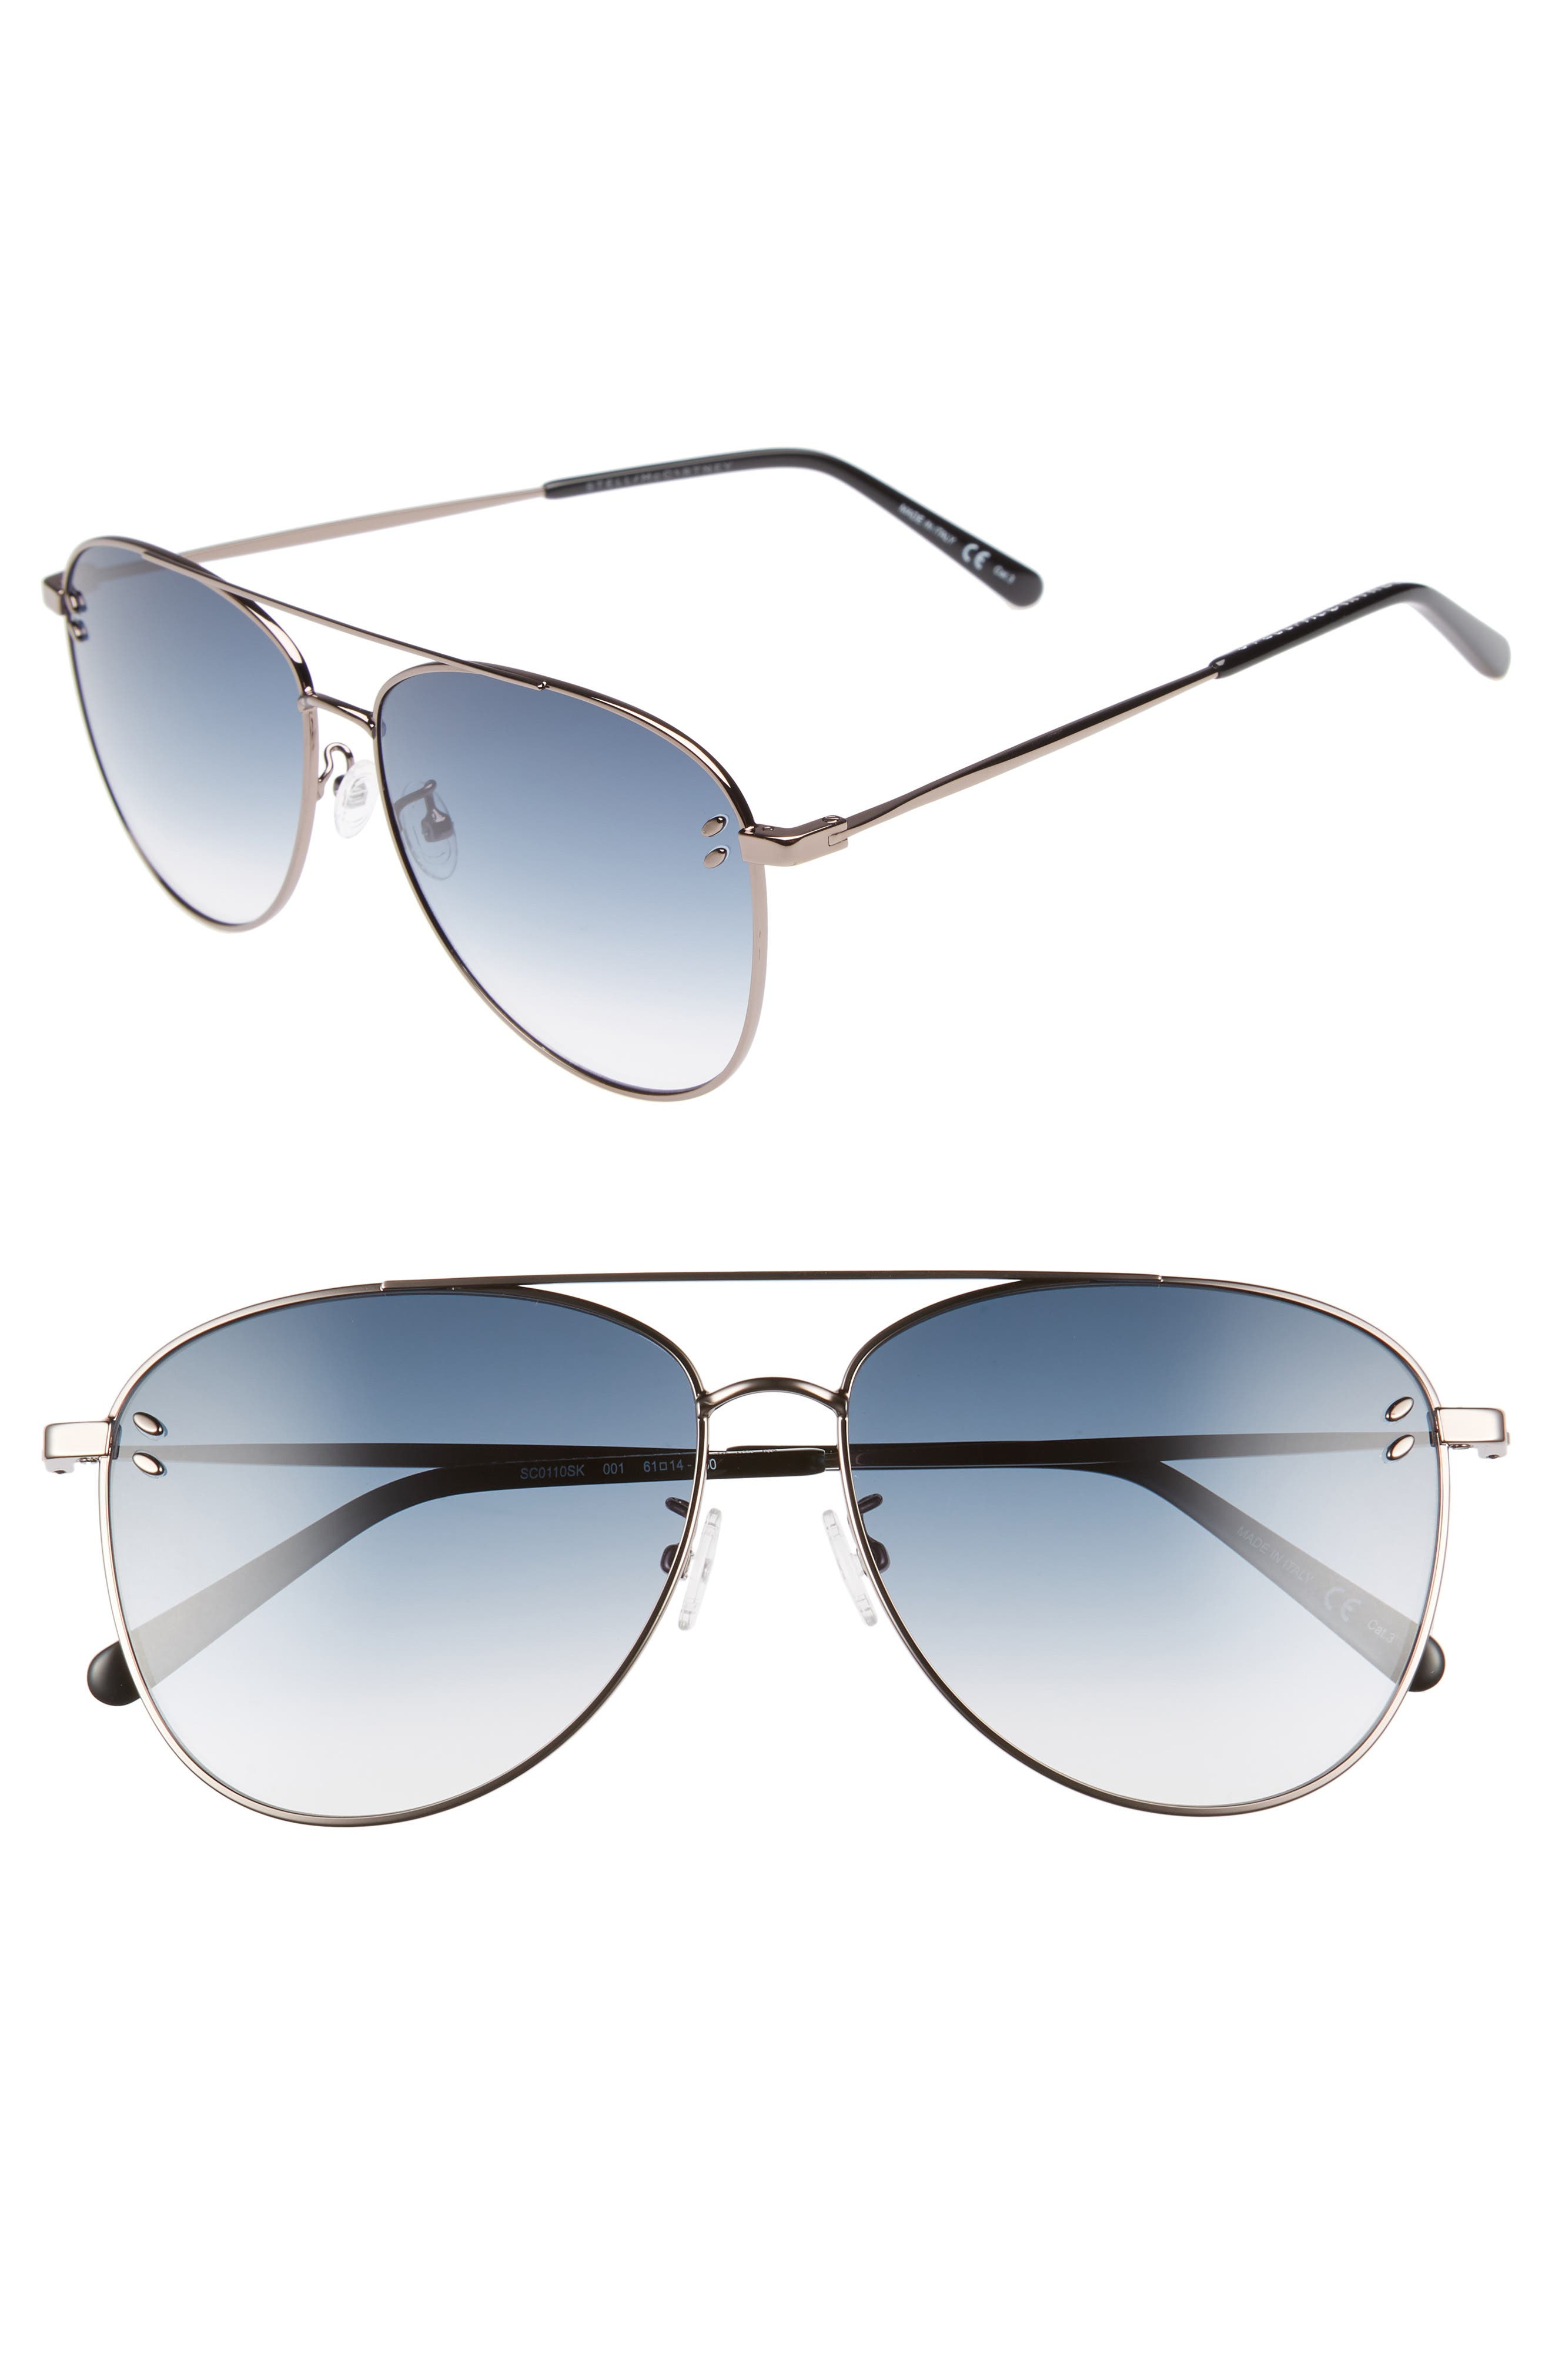 61mm Aviator Sunglasses,                         Main,                         color, 041